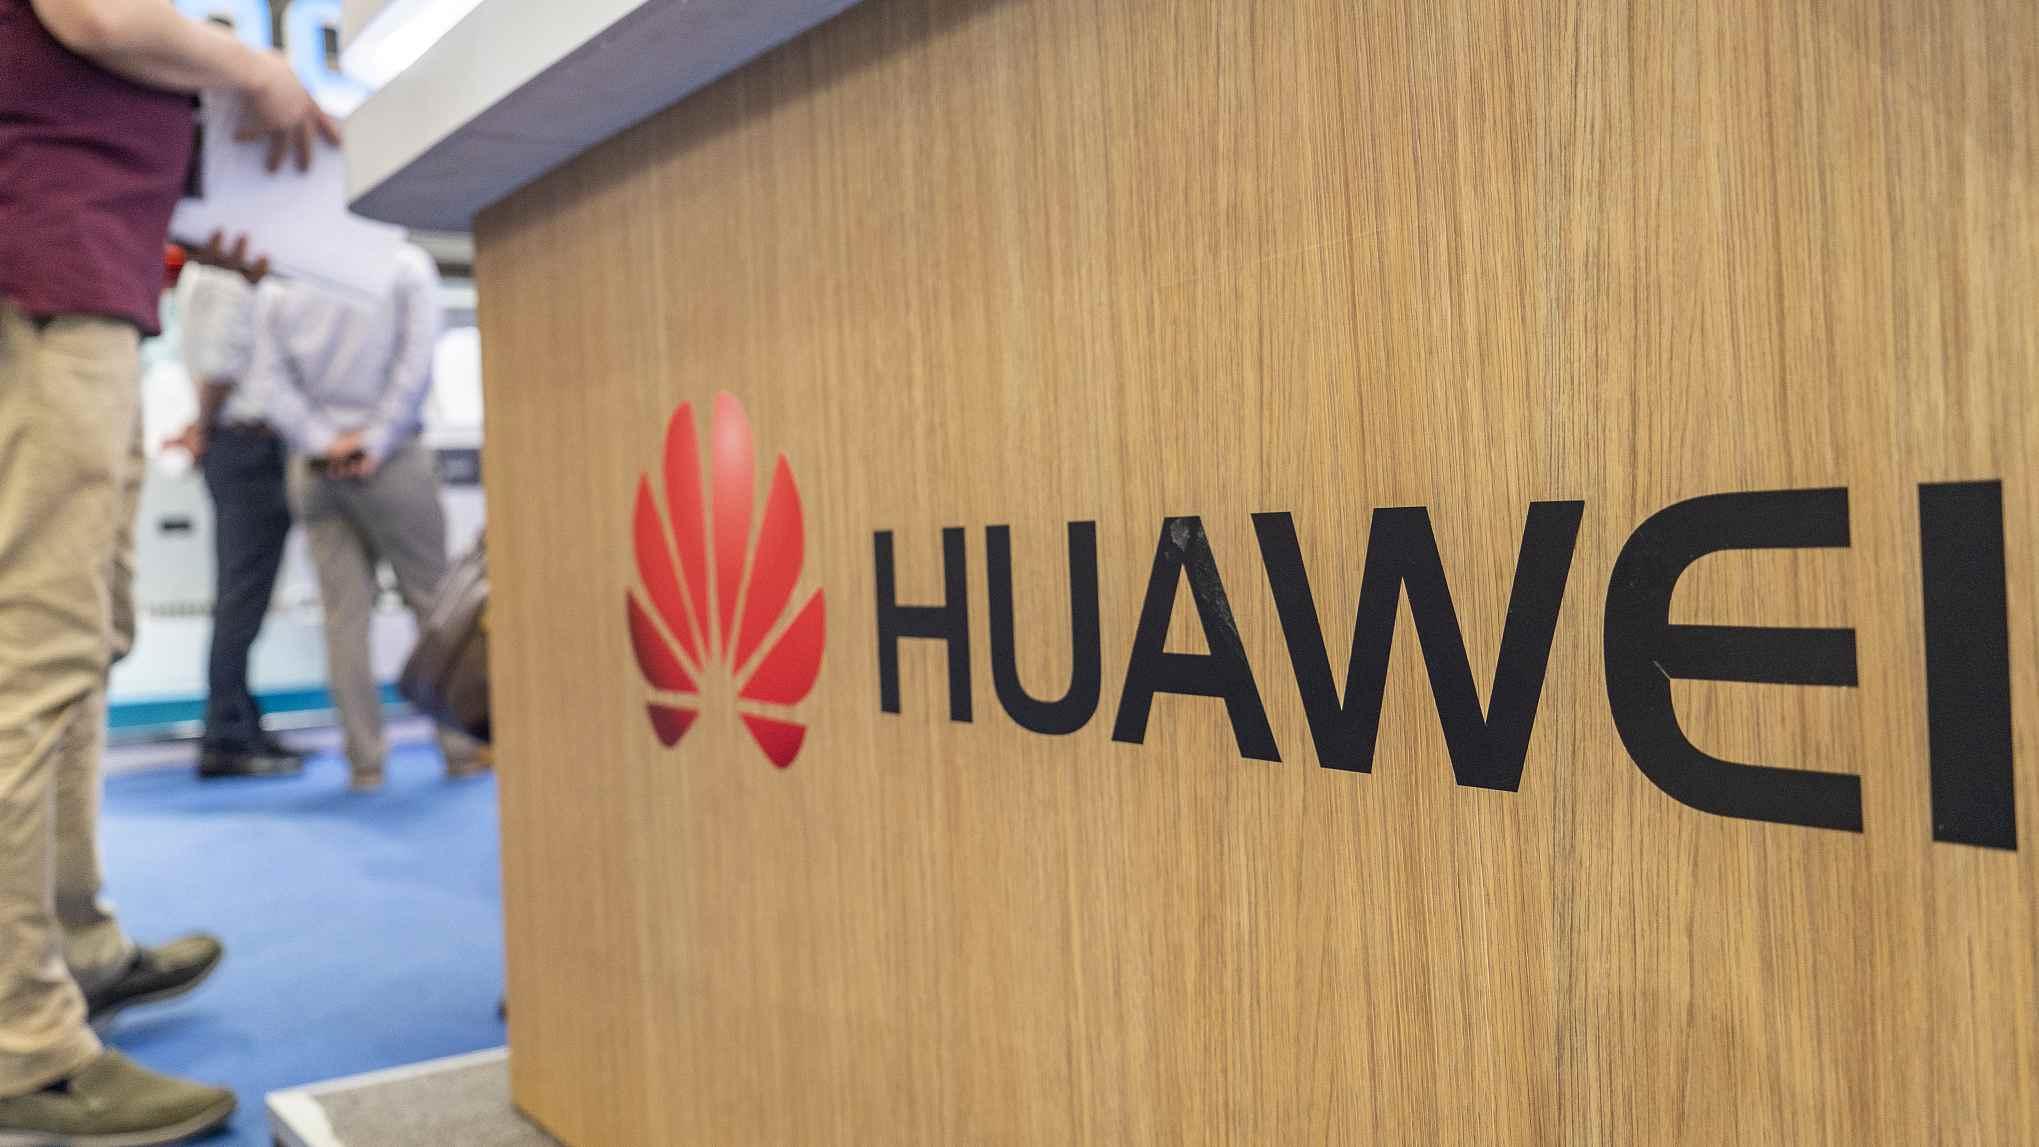 Huawei blasts Australian security concerns